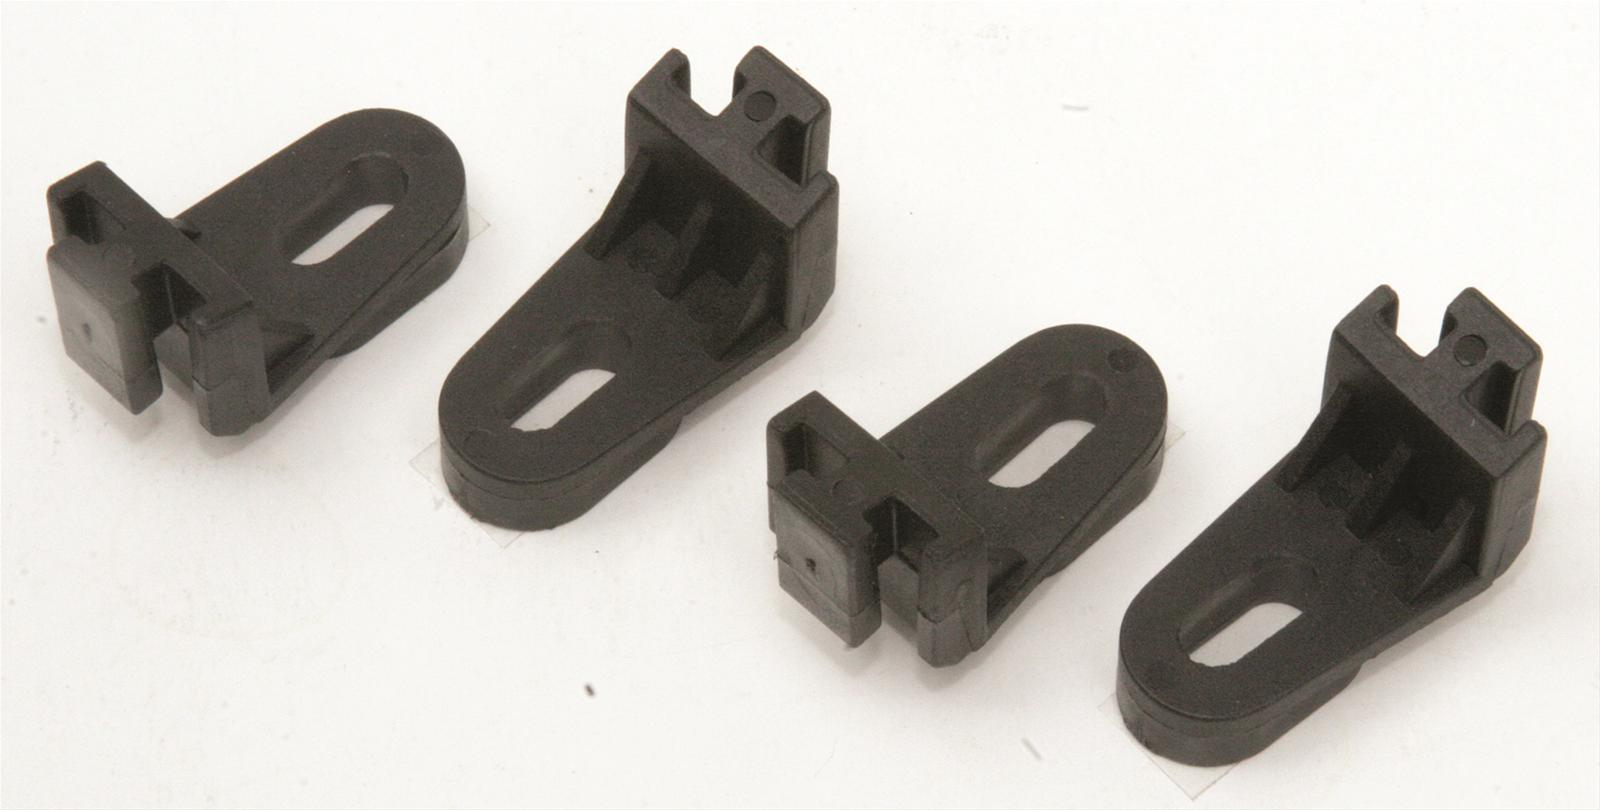 Fan Mounting Hardware : Perma cool electric fan mounting brackets nylon black set